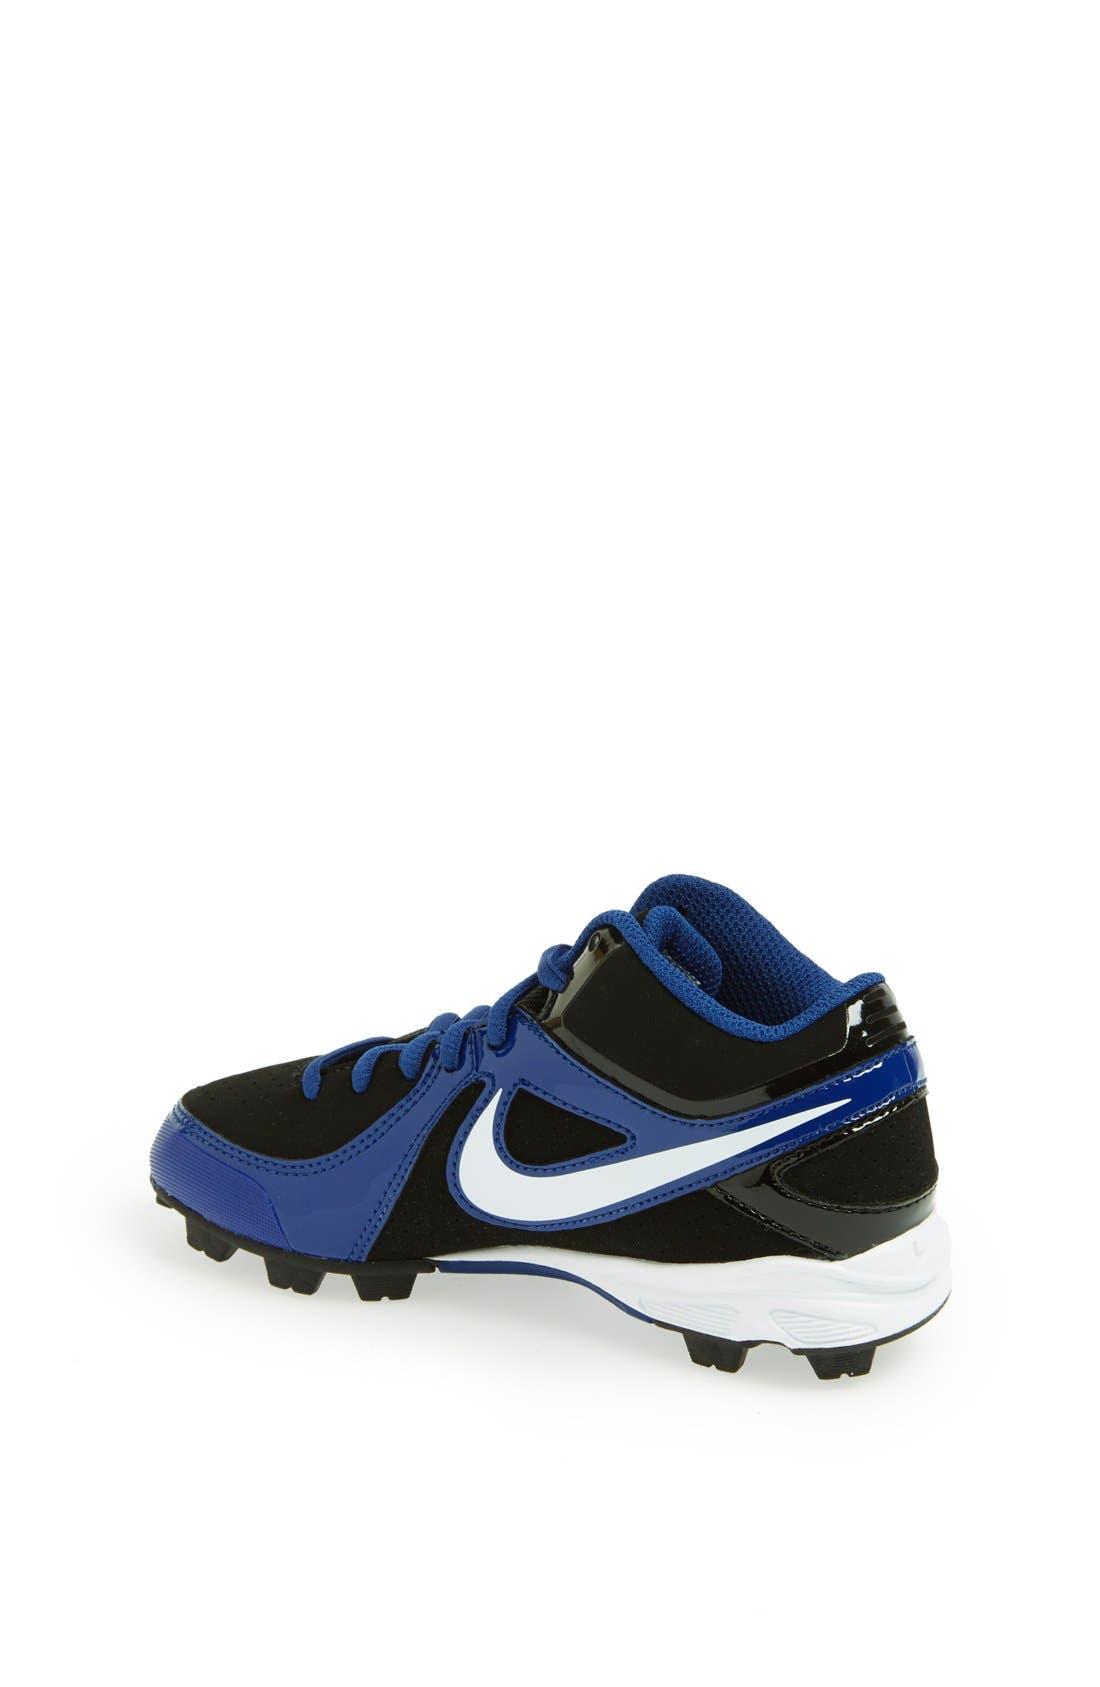 Alternate Image 2  - Nike 'MVP Keystone 3/4' Baseball Cleat (Toddler, Little Kid & Big Kid)